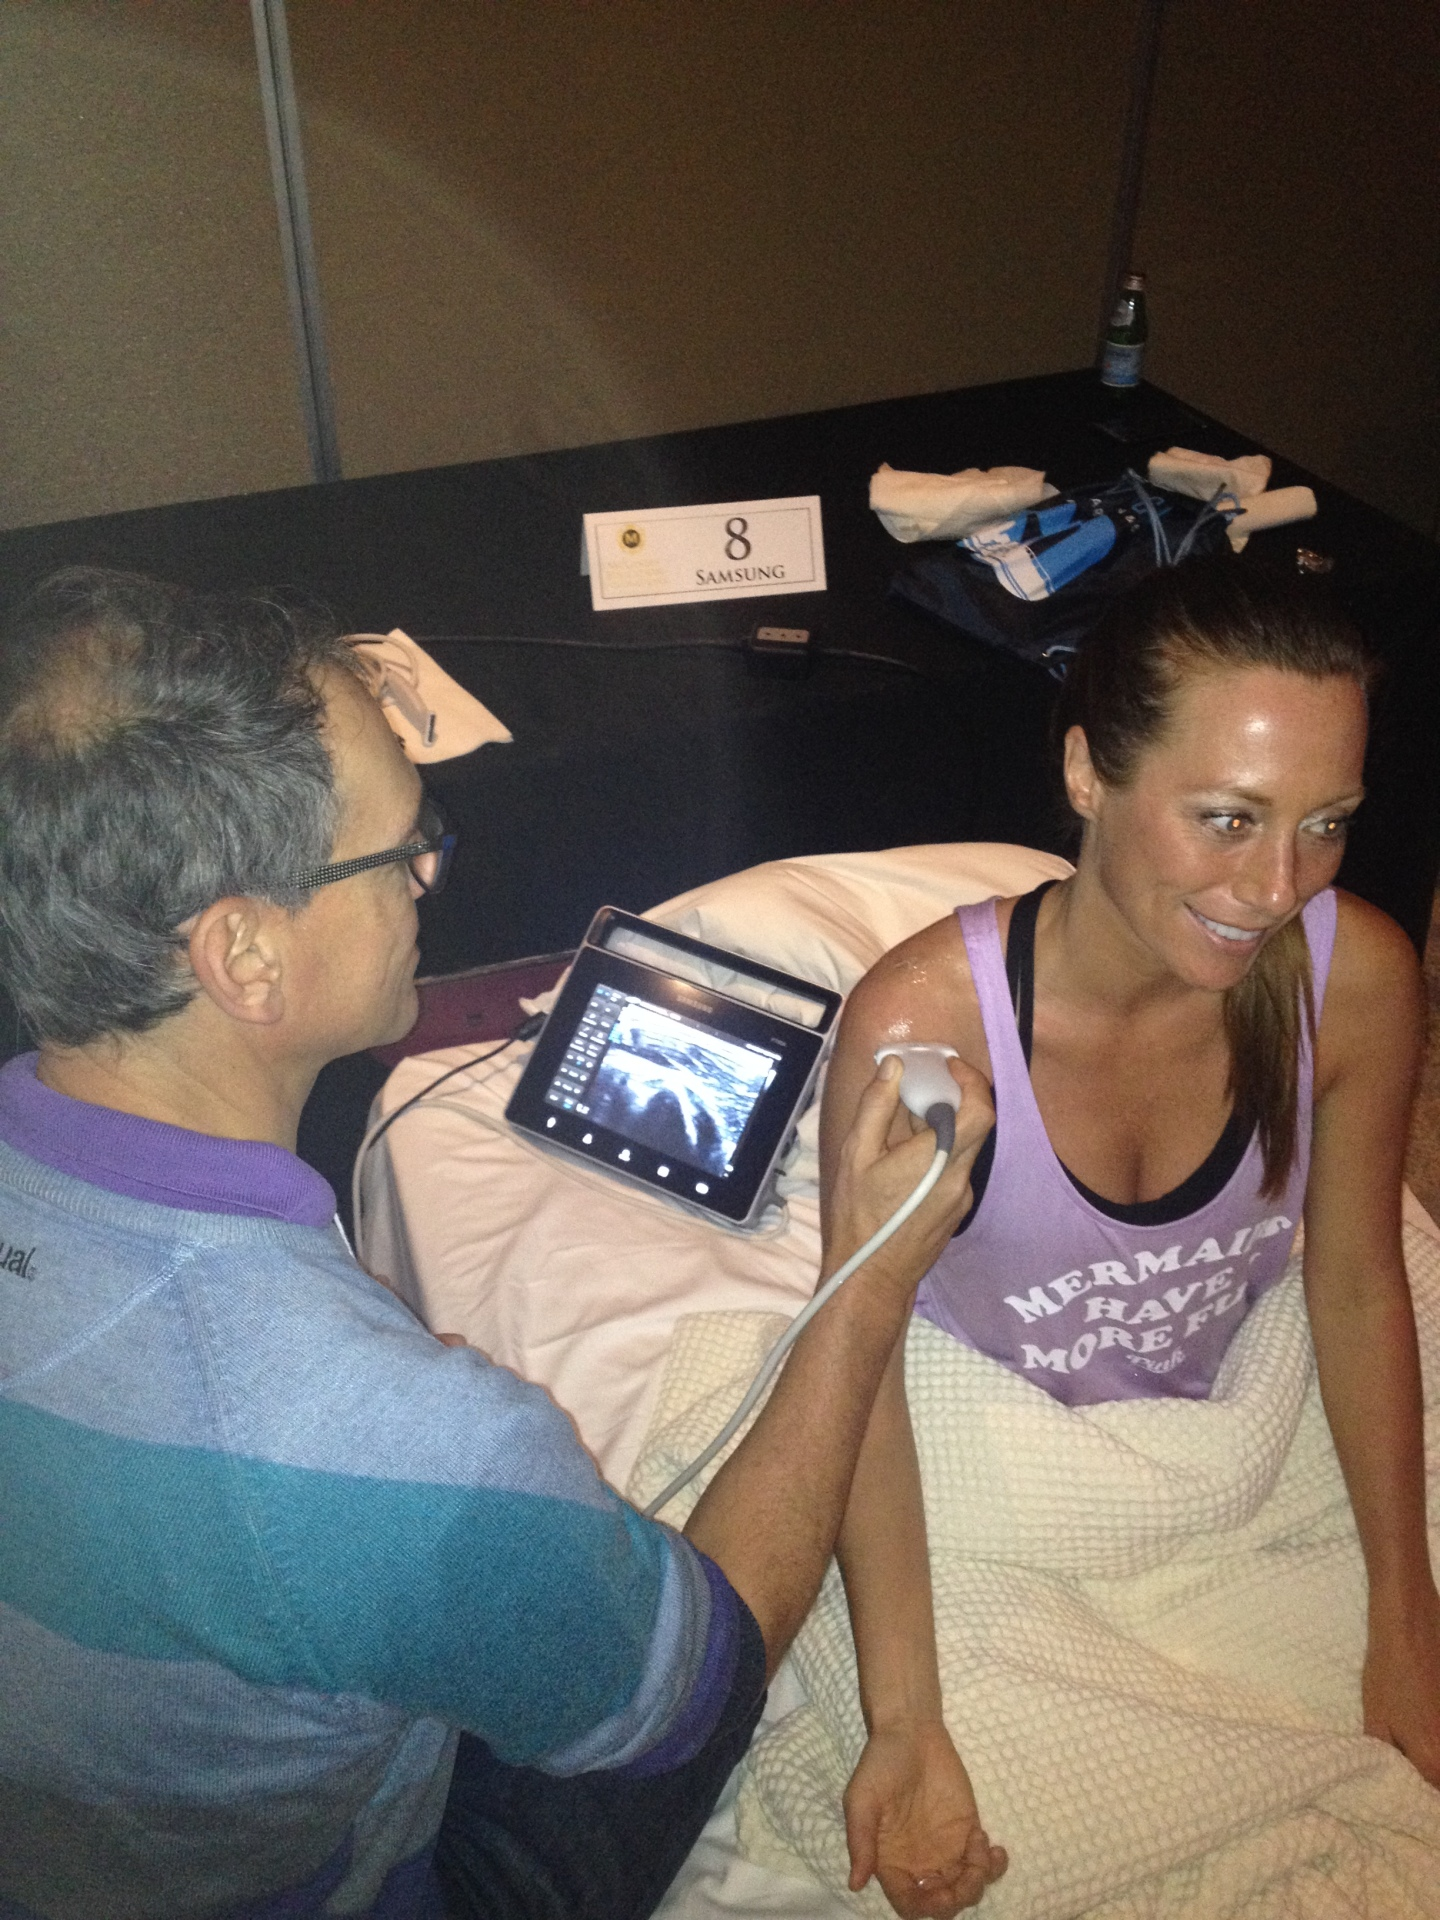 Ultrasound Model - Medical Device Demonstrations